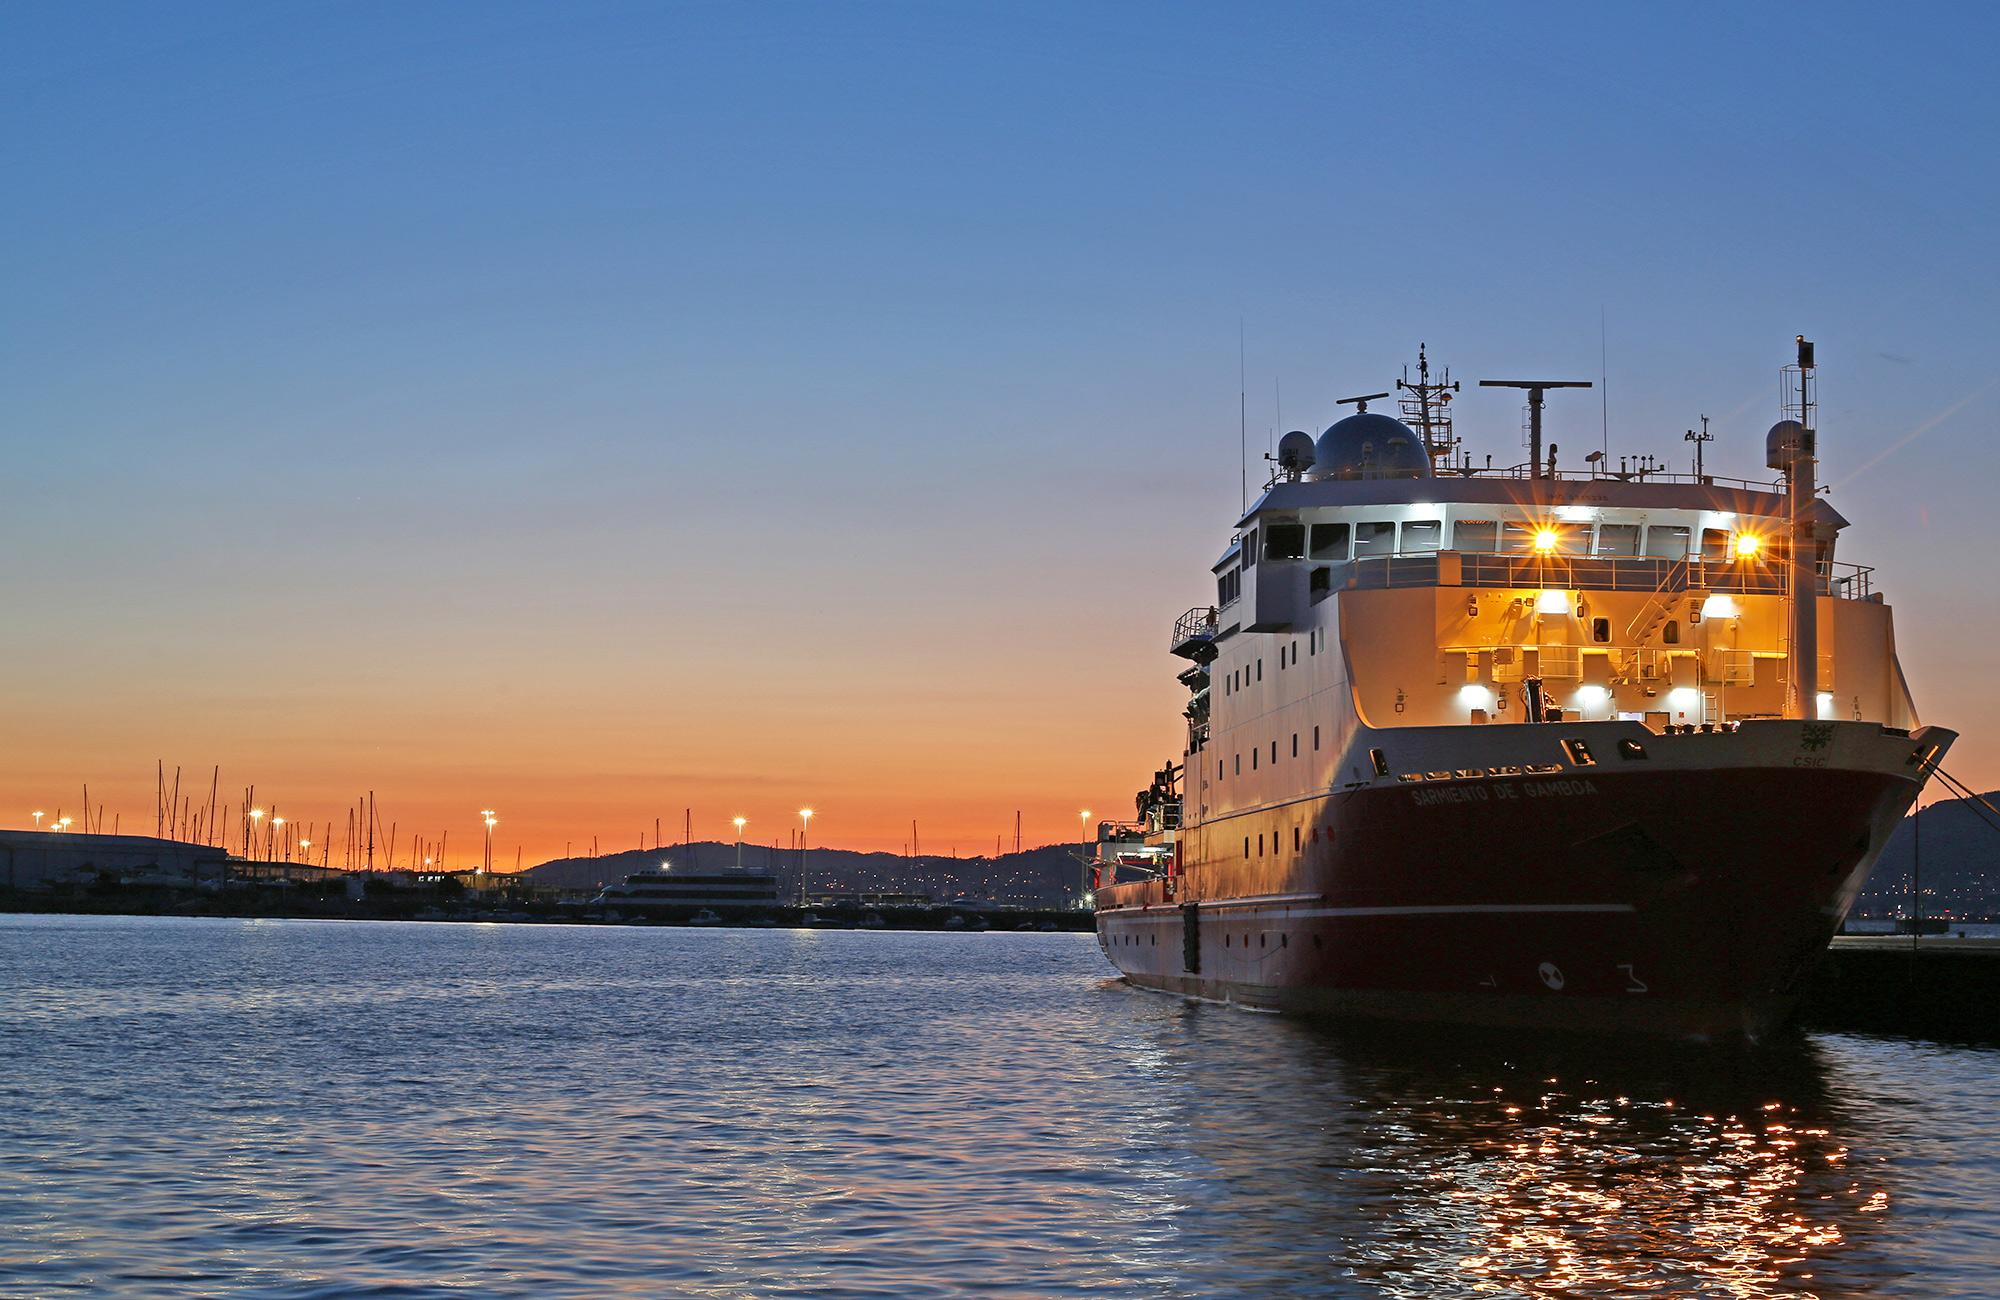 Research vessel Sarmiento de Gamboa at sunset